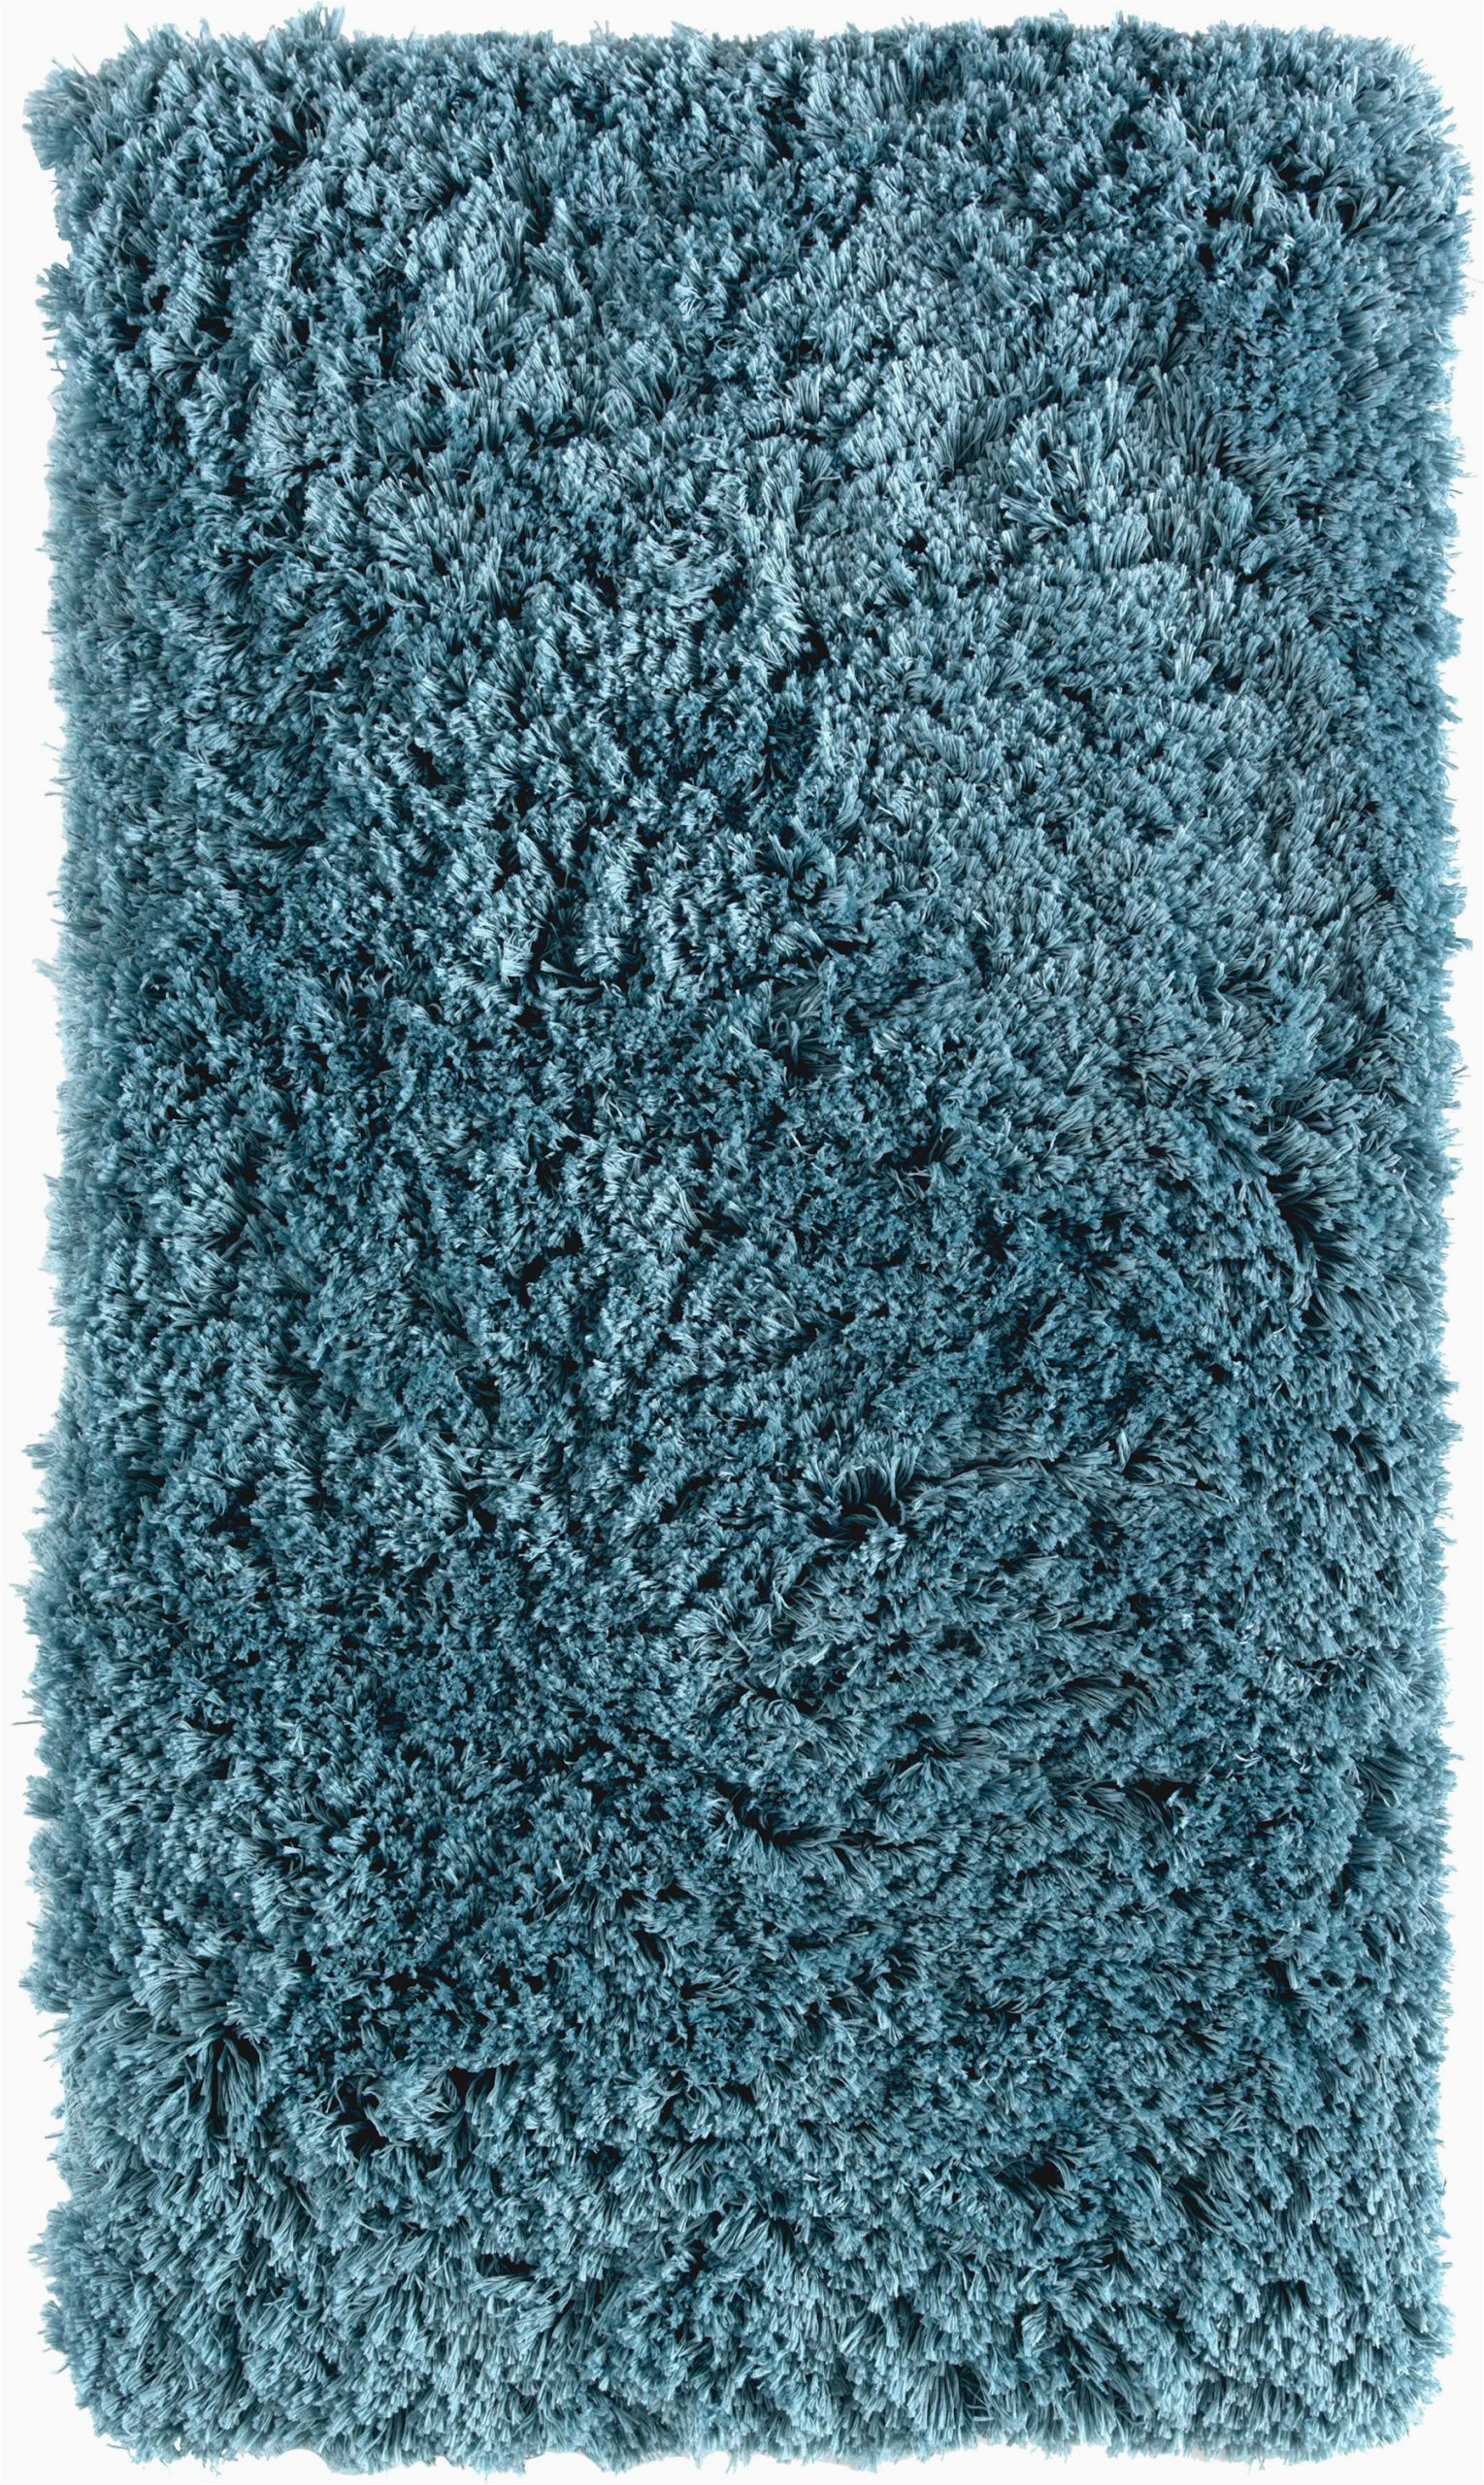 "Micro Plush Memory Foam Bath Rug Hotel Style Ultra Plush & soft Memory Foam Bath Rug Teal 22"" X 40"" Walmart"